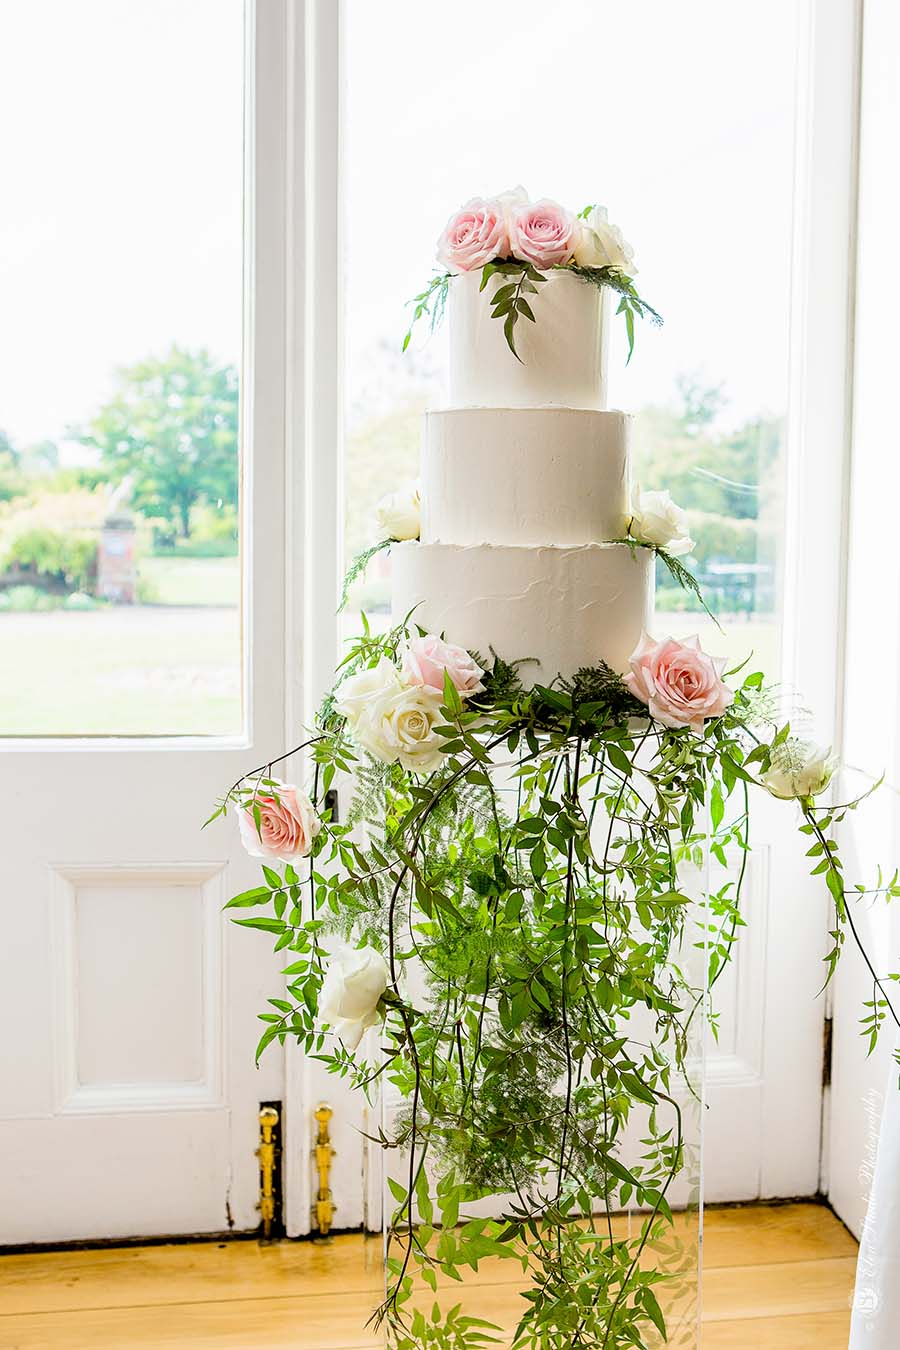 Hodsock-priory-wedding-fair-Elen-Studio-Photography-010